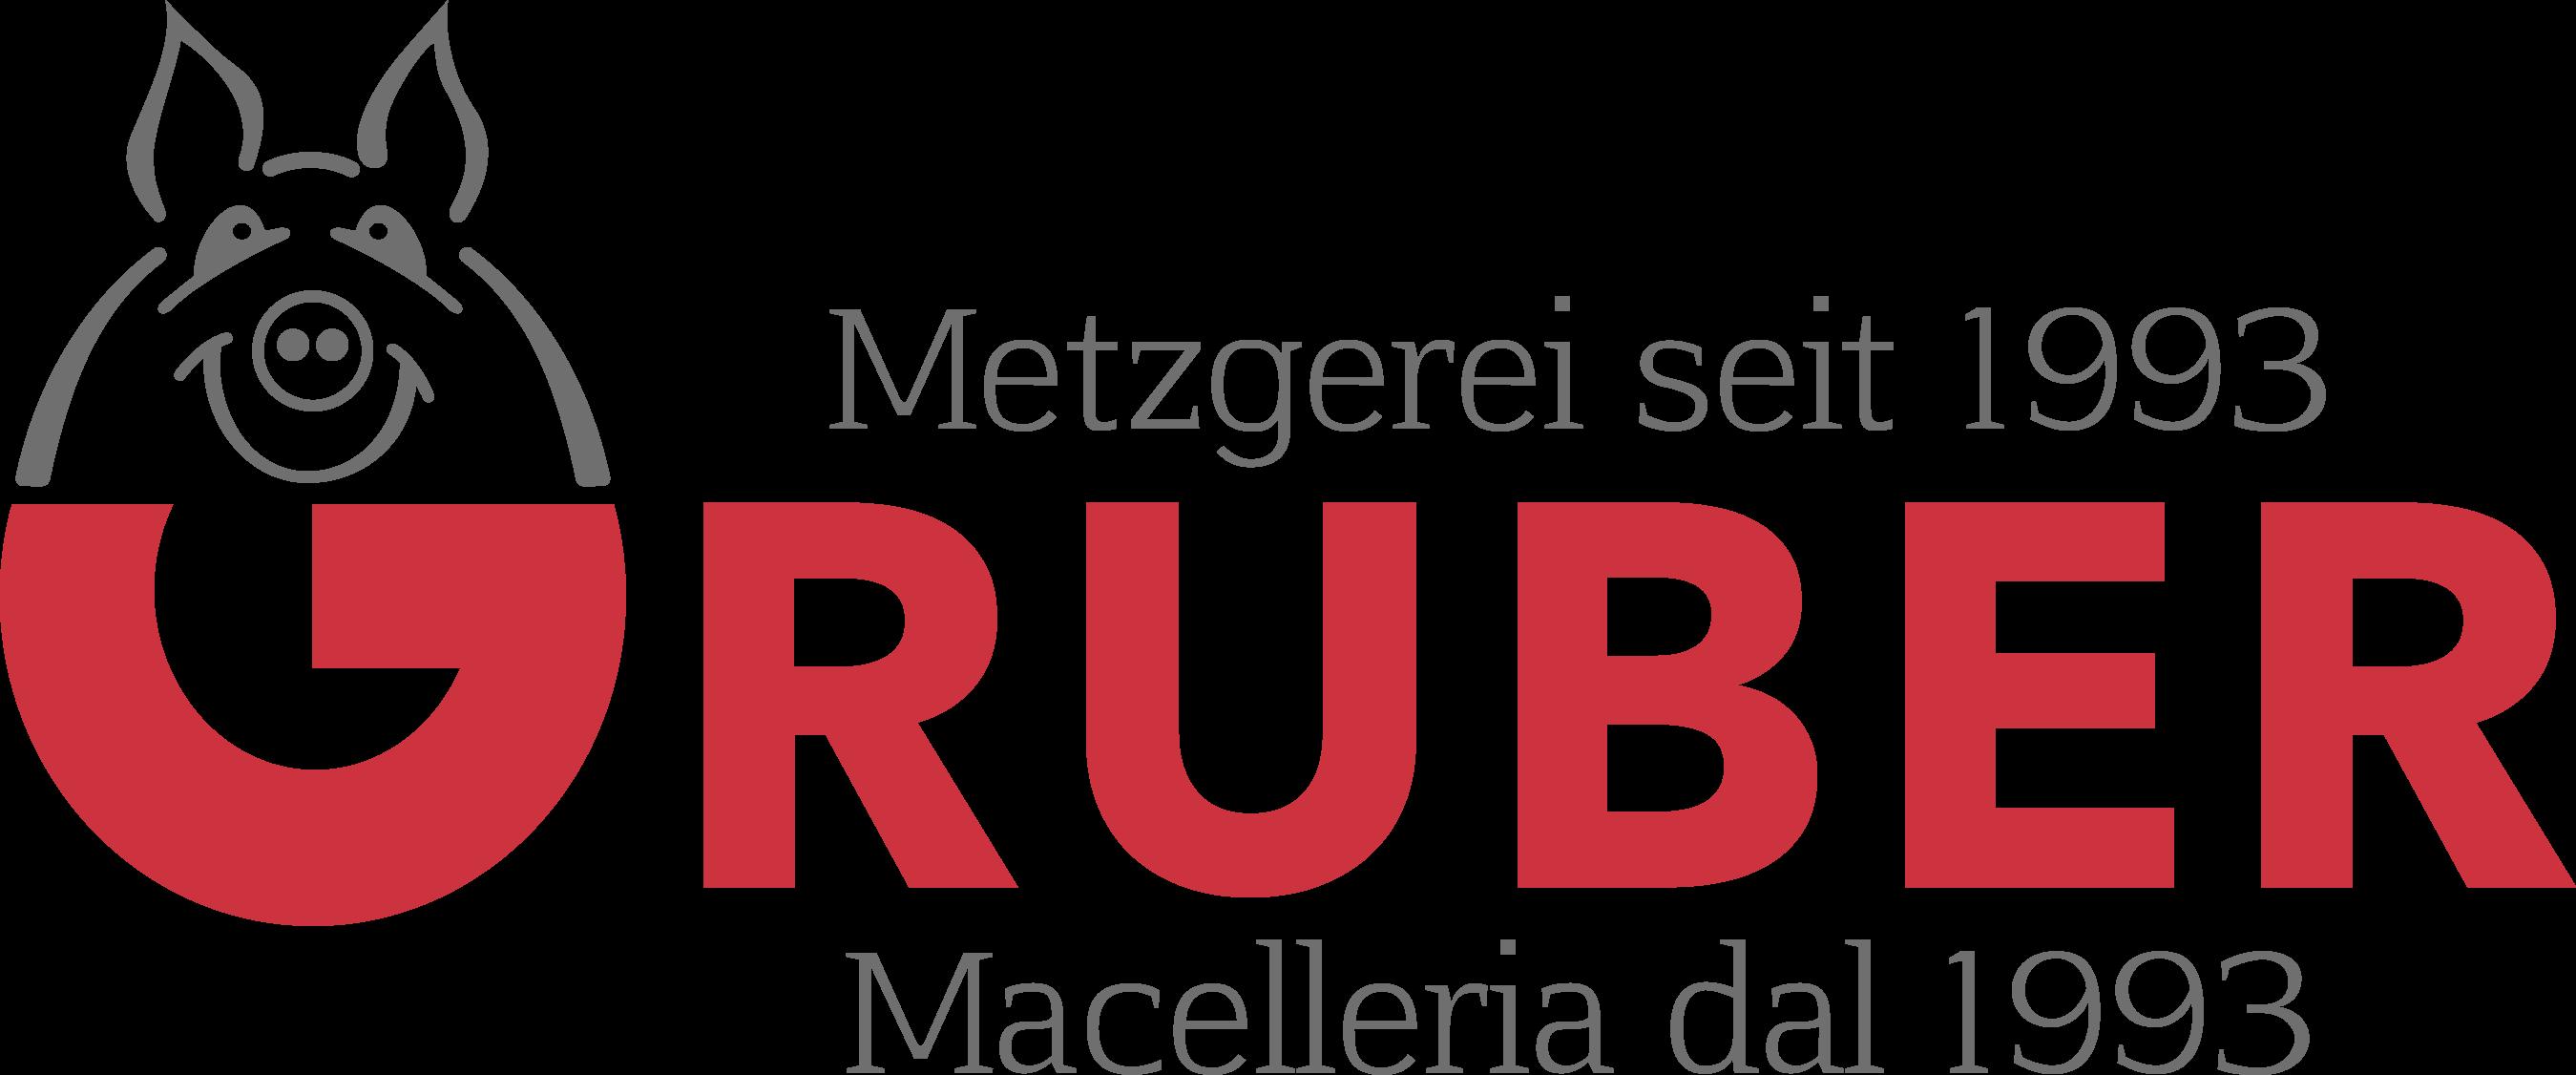 logo_gruber_quer.png